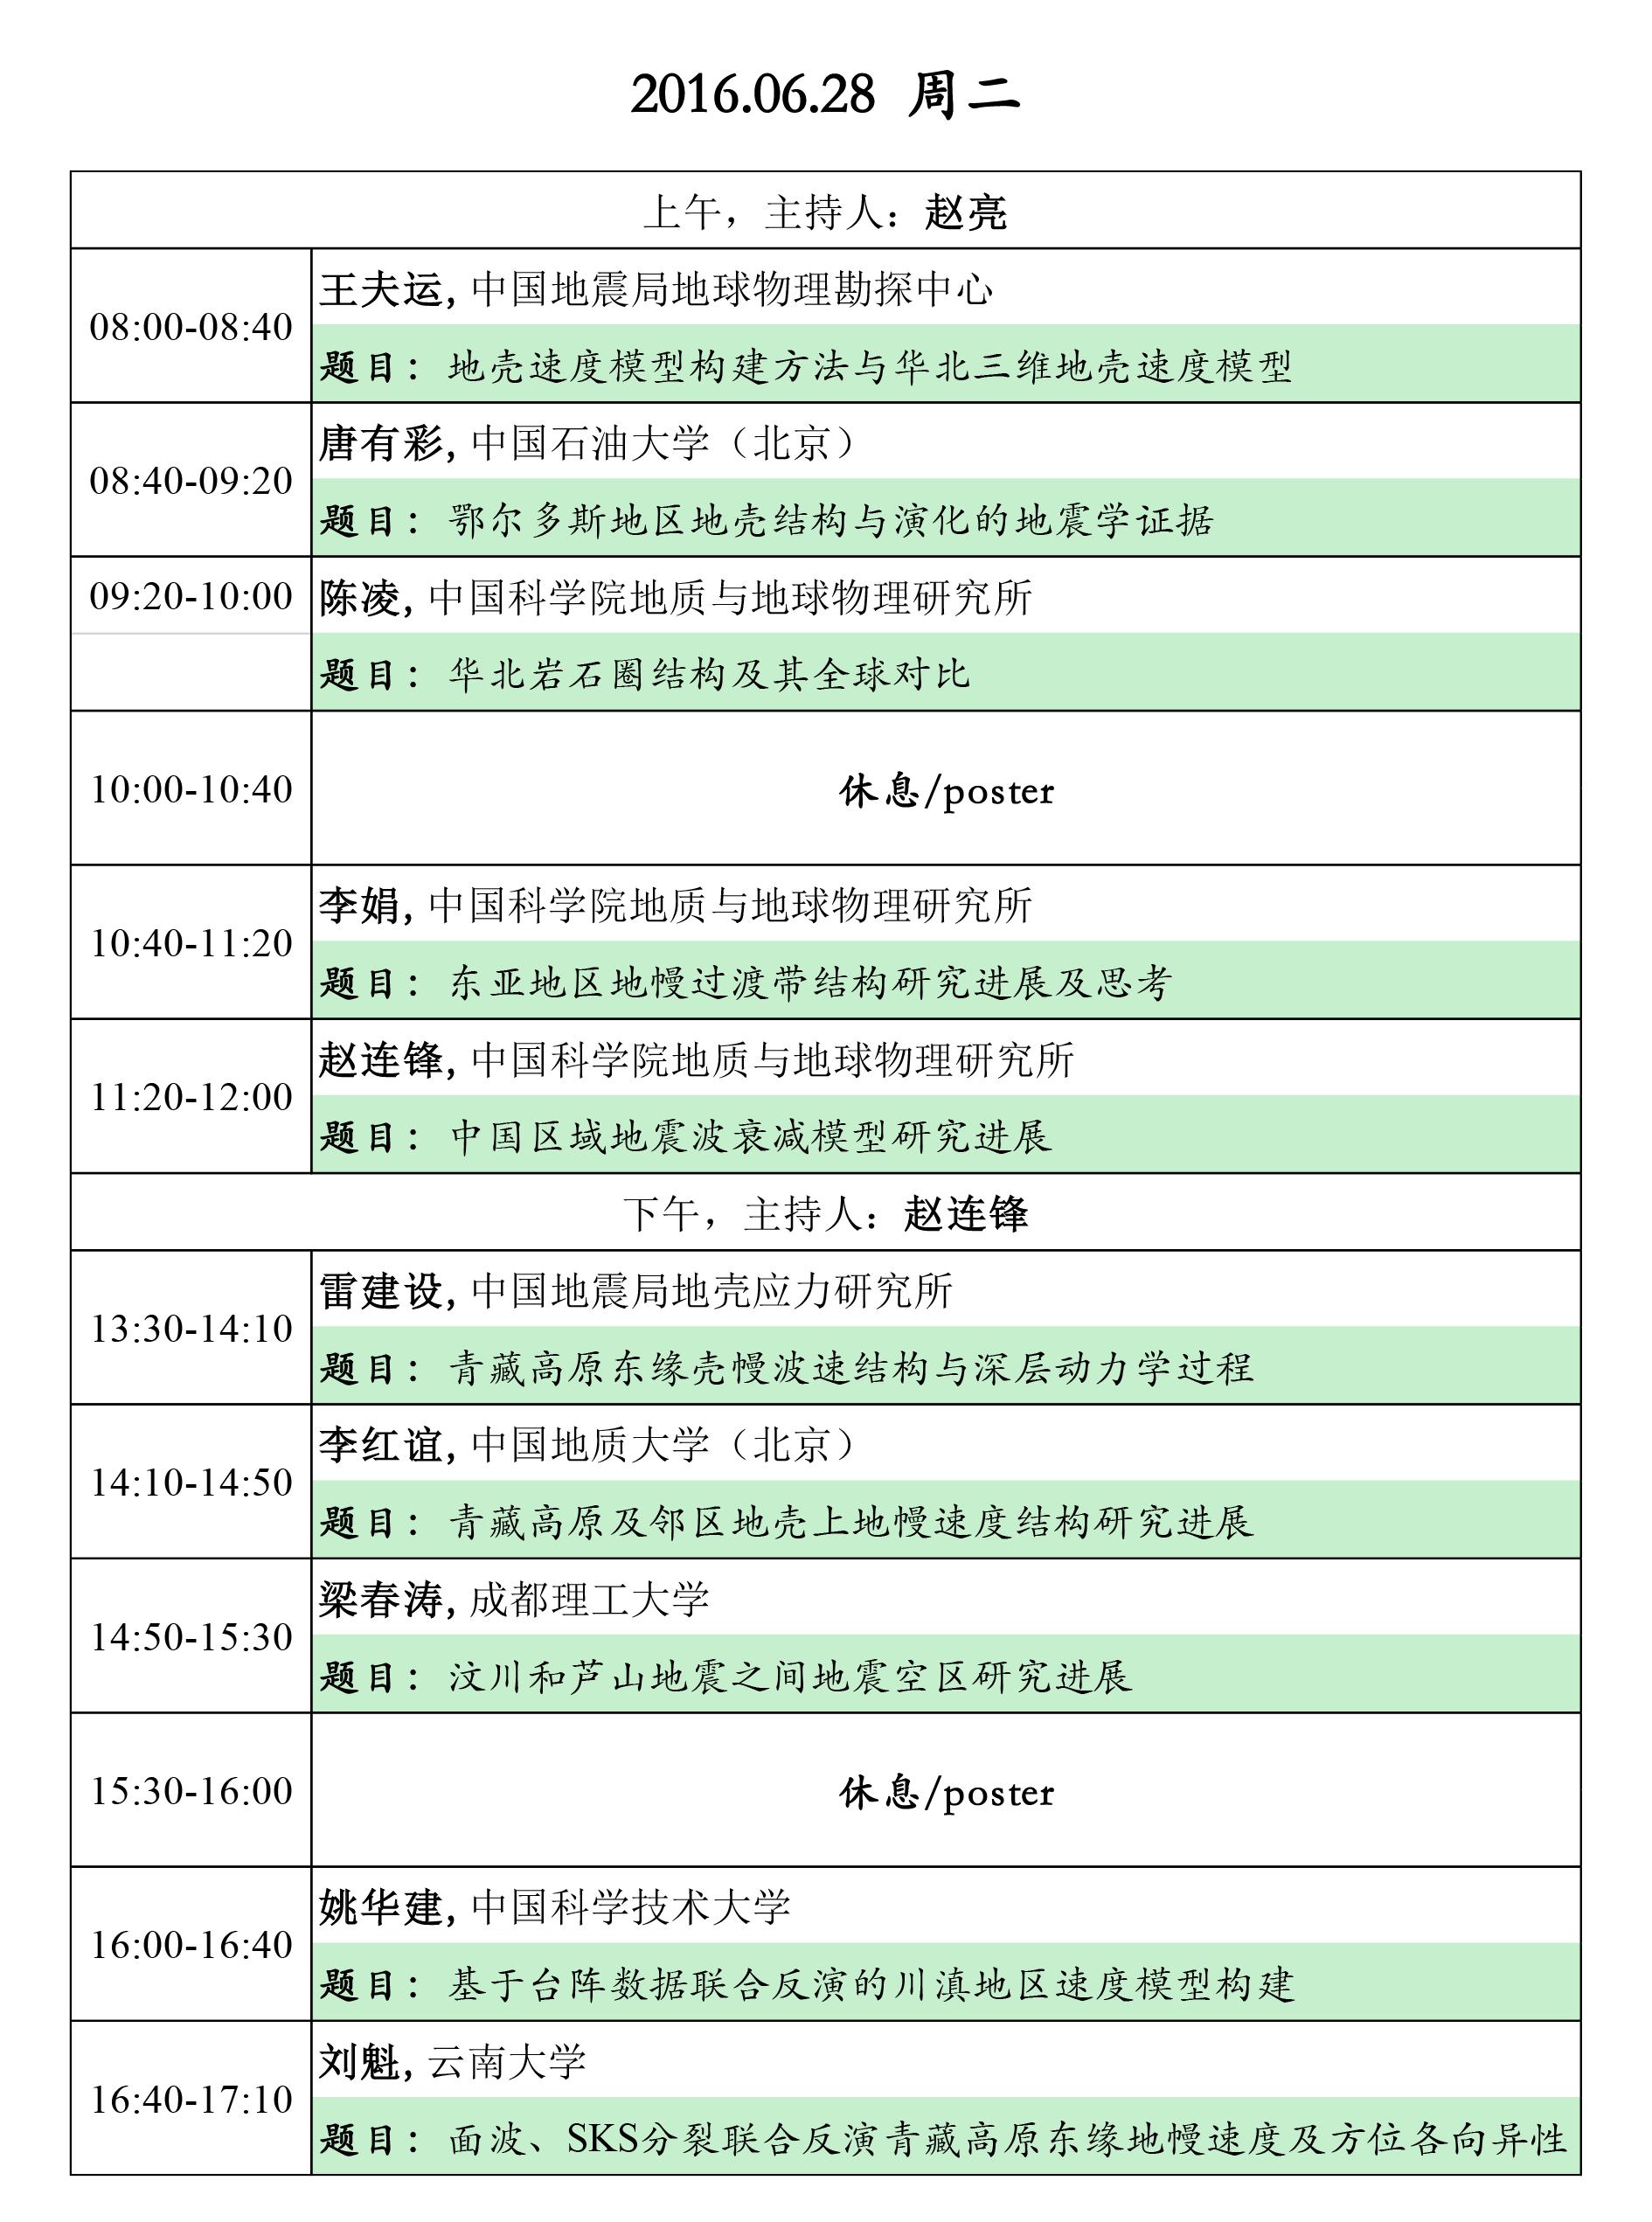 calendar_6_28-01